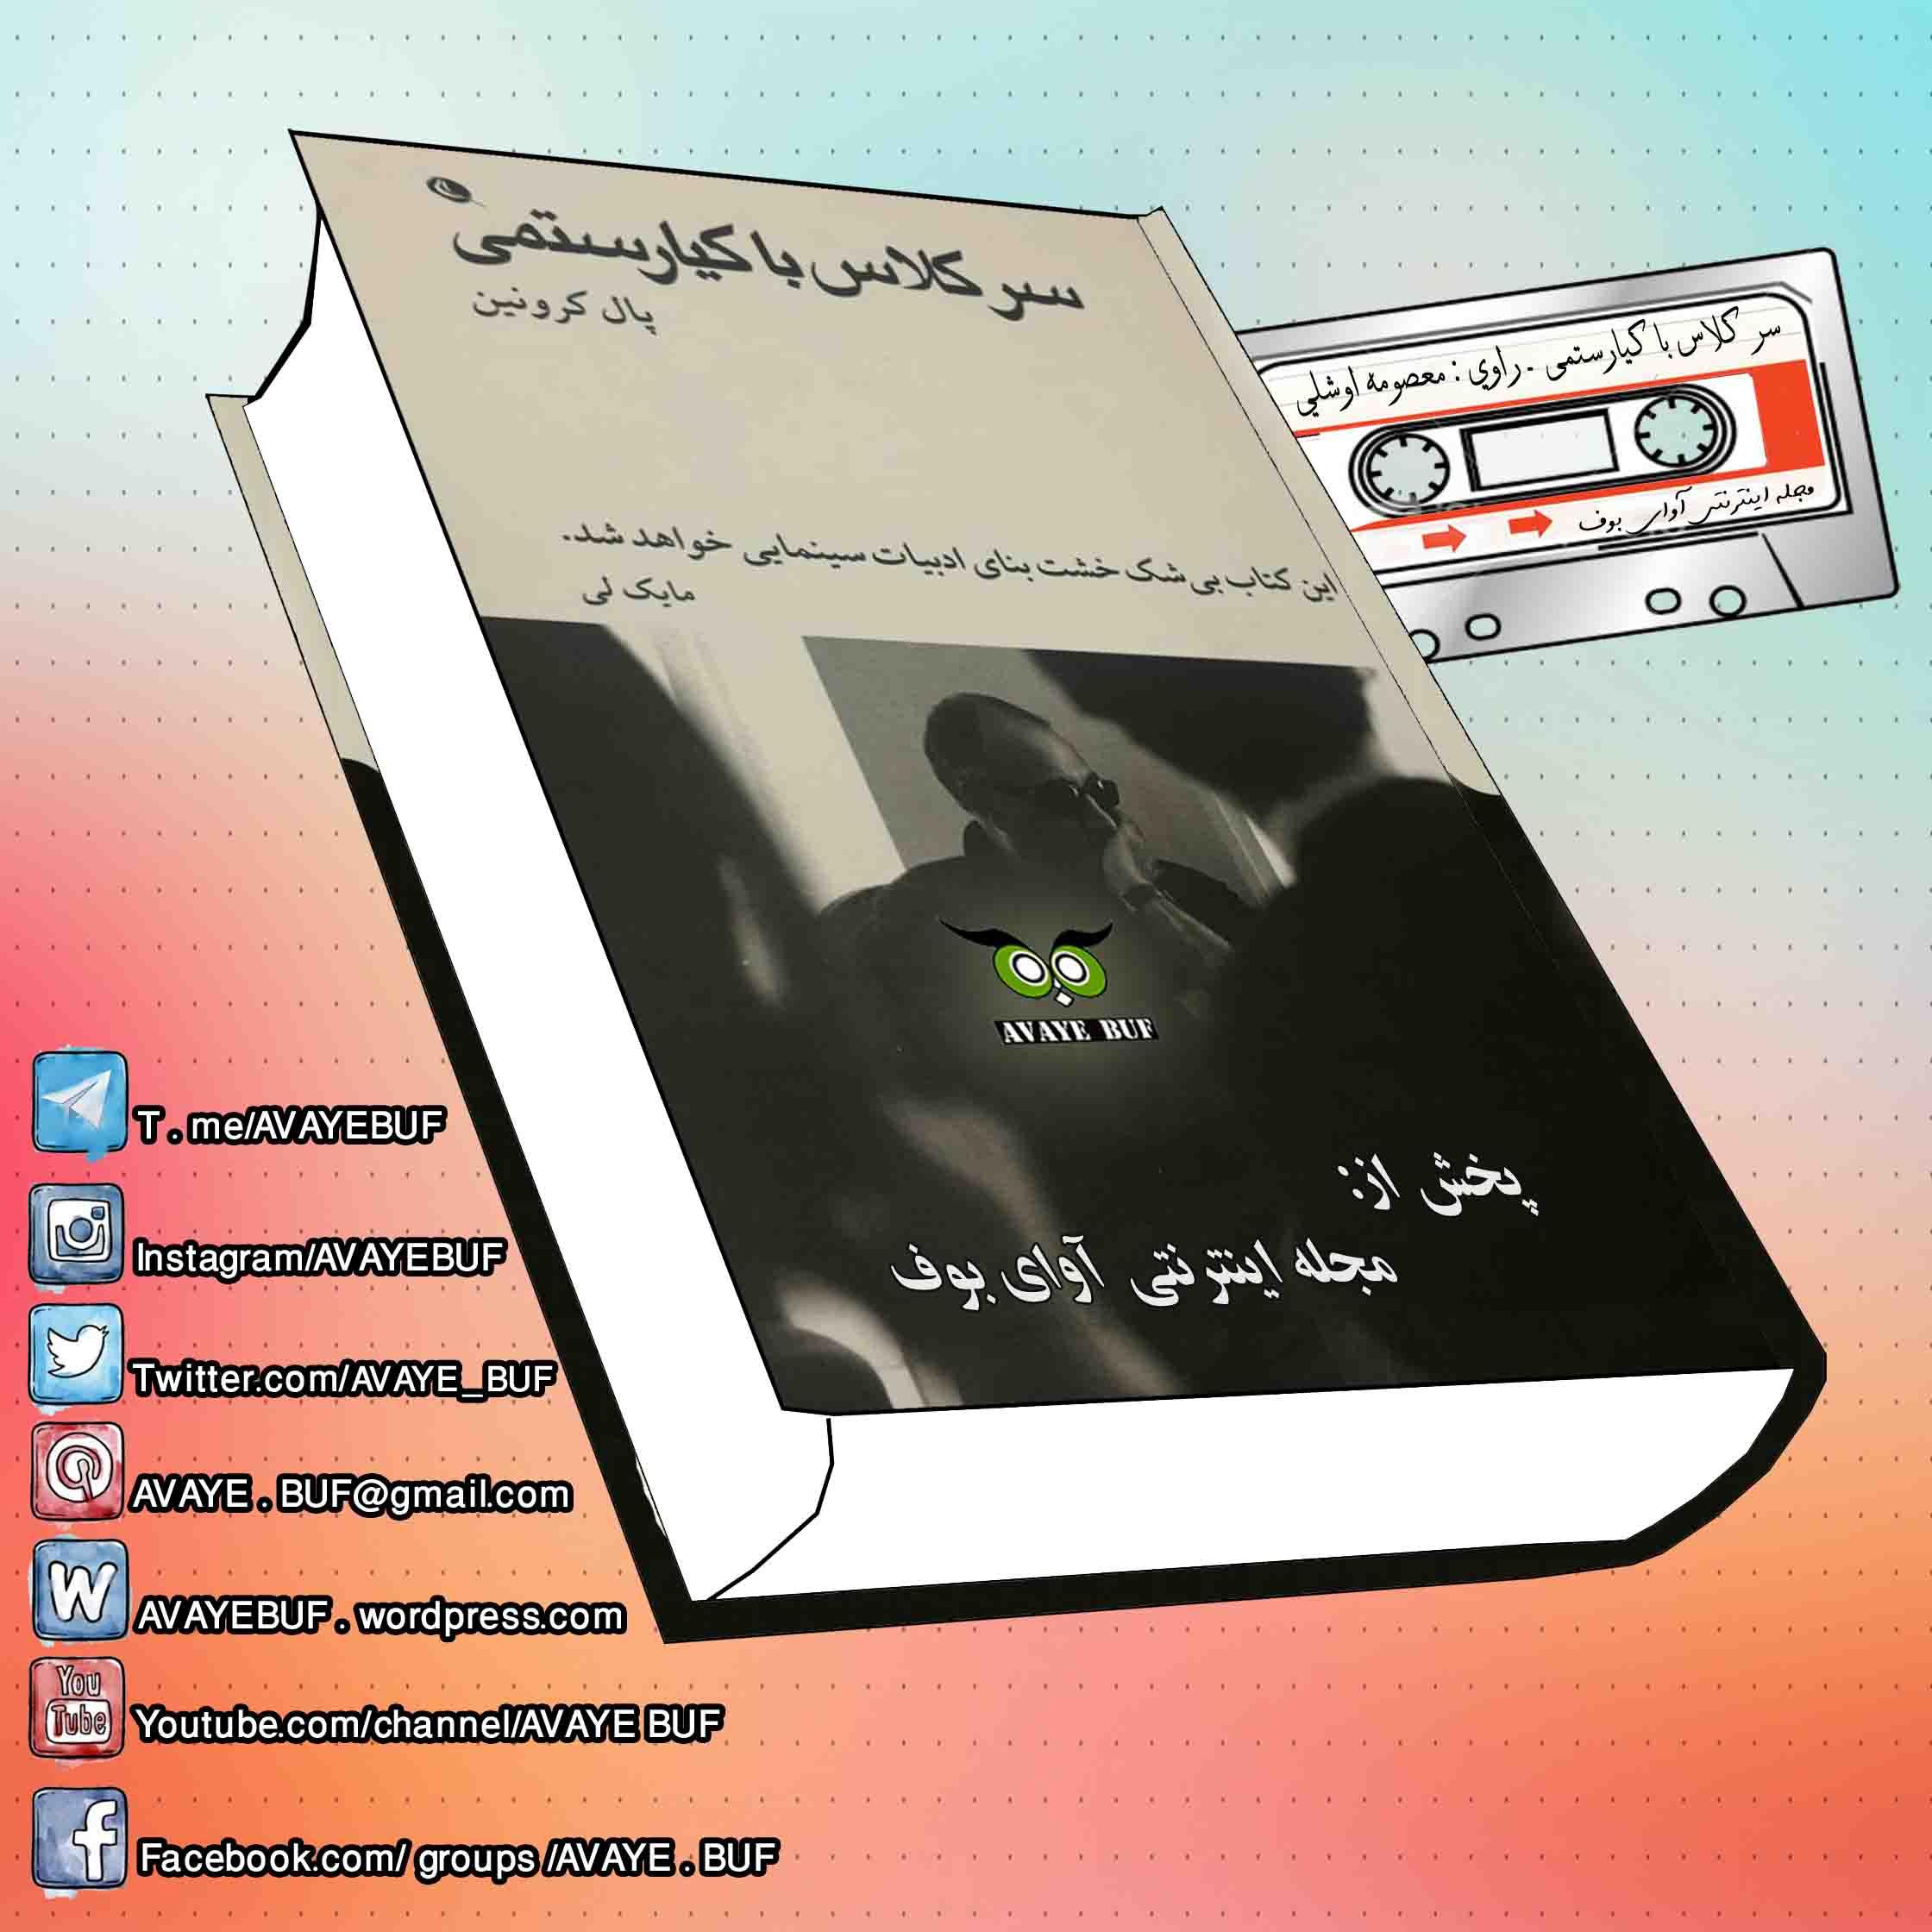 _Sare_Kelas_Ba_Kiarostami_AVAYeBUF_Wordpress_Com